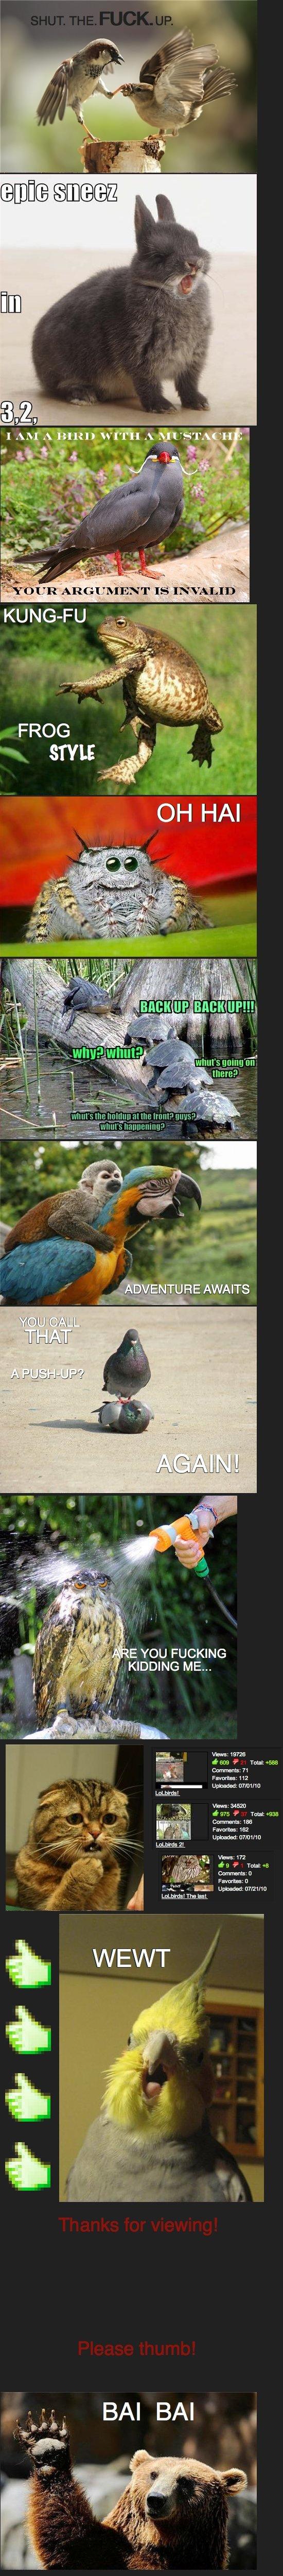 LoL animals. Part two:. Don't mind me I'm just washing my owl Evasion LoLbirds lol animals